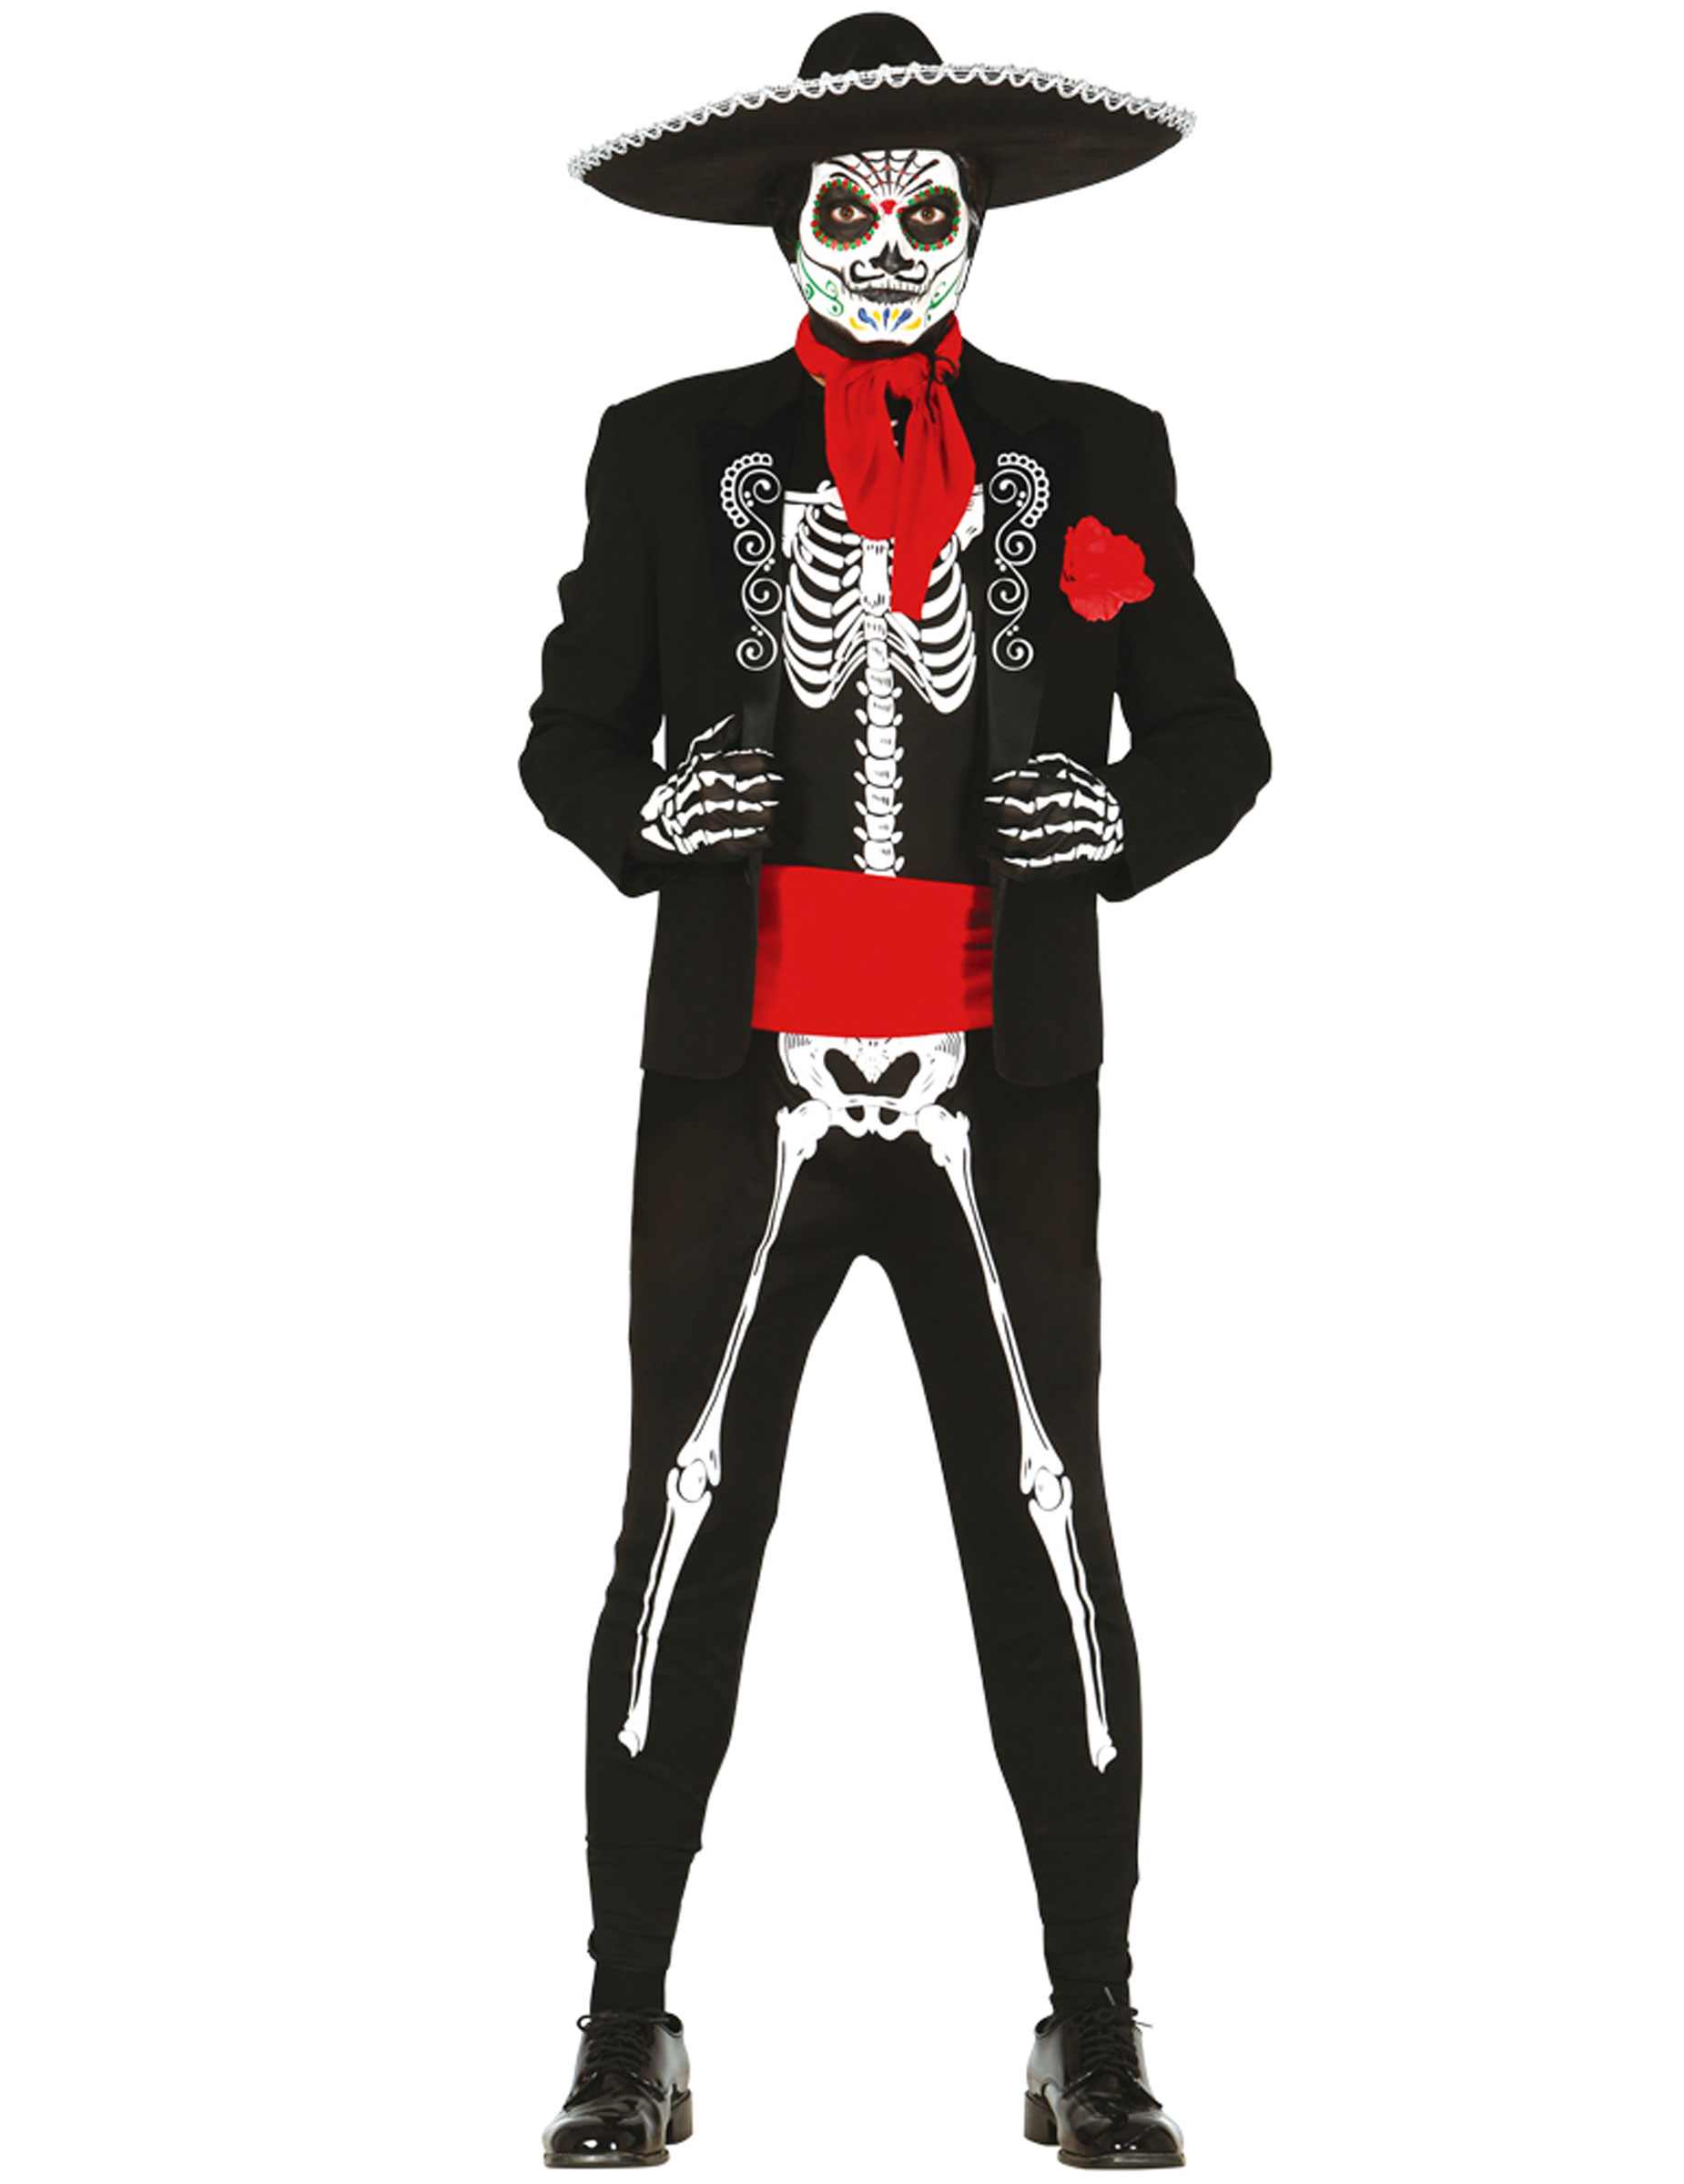 dia de los muertos kost m f r herren skelett anzug schwarz weiss rot g nstige faschings. Black Bedroom Furniture Sets. Home Design Ideas